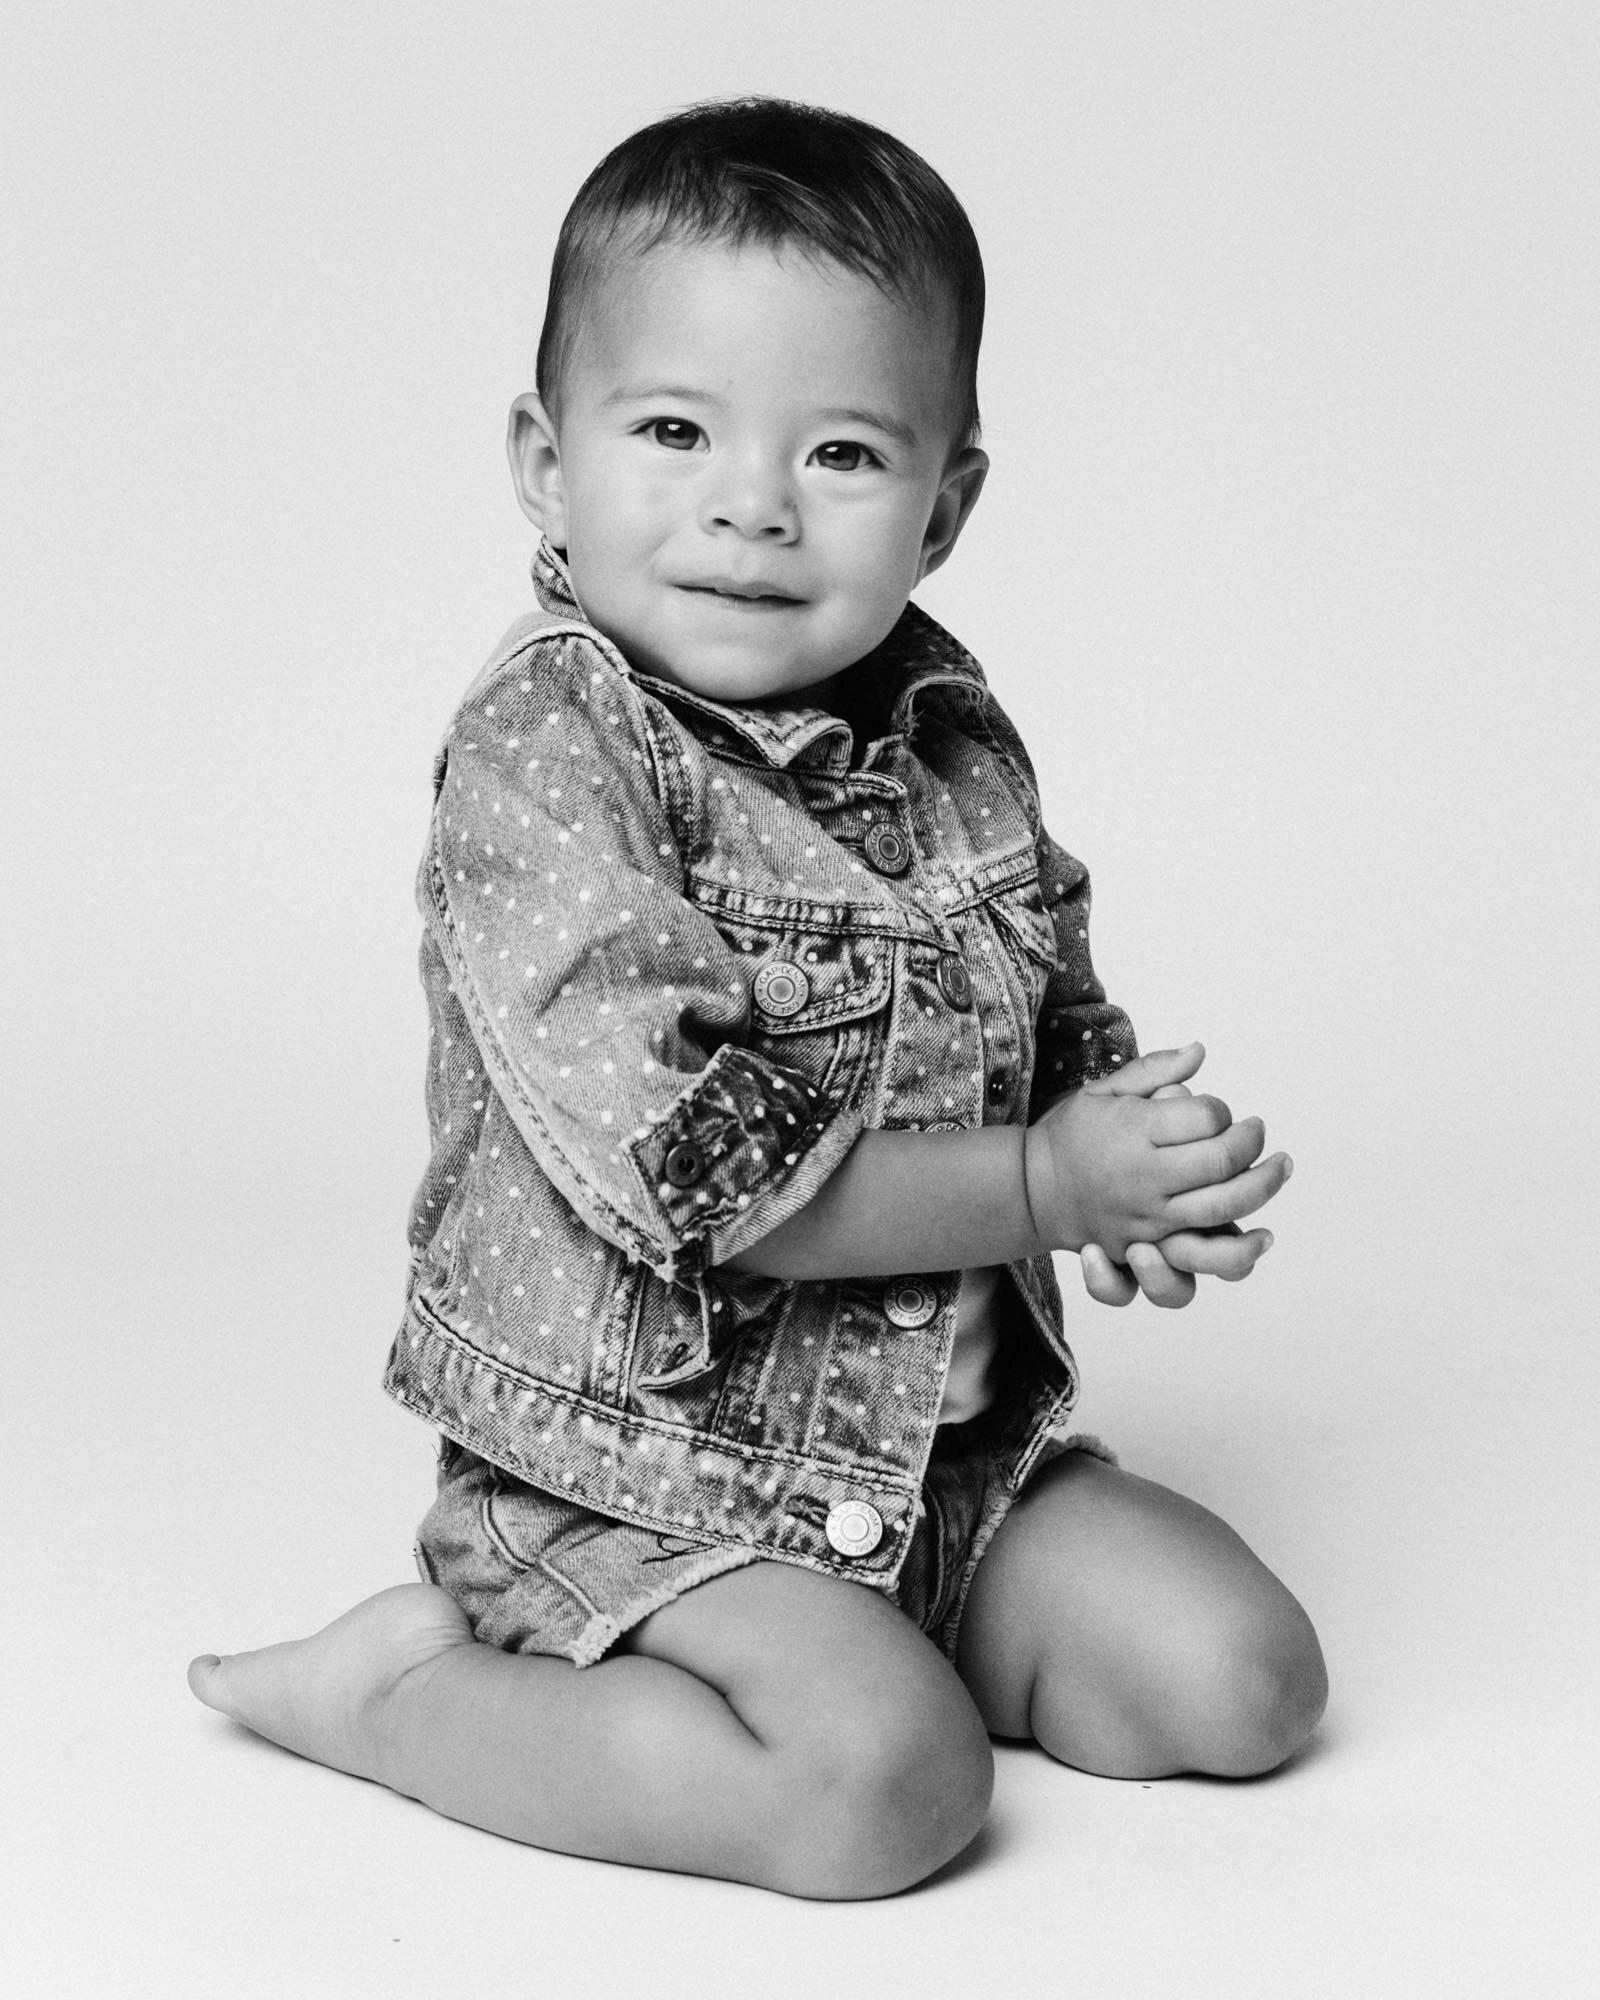 nyc-photographers-baby-modeling-nyc-10003.jpg